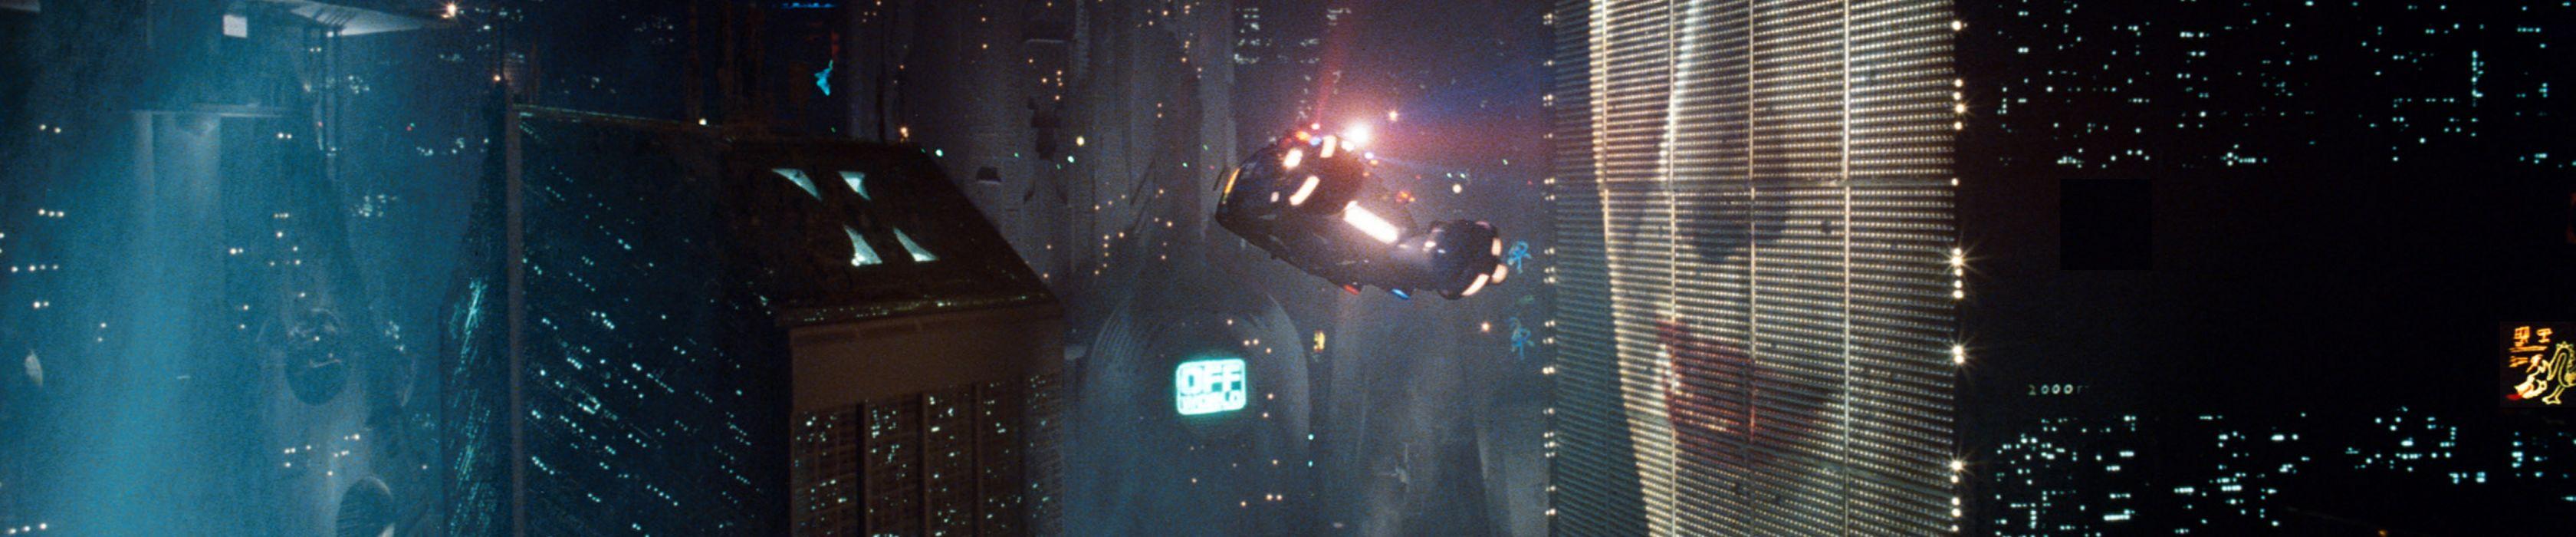 Blade Runner science fiction multiscreen flying cars wallpaper